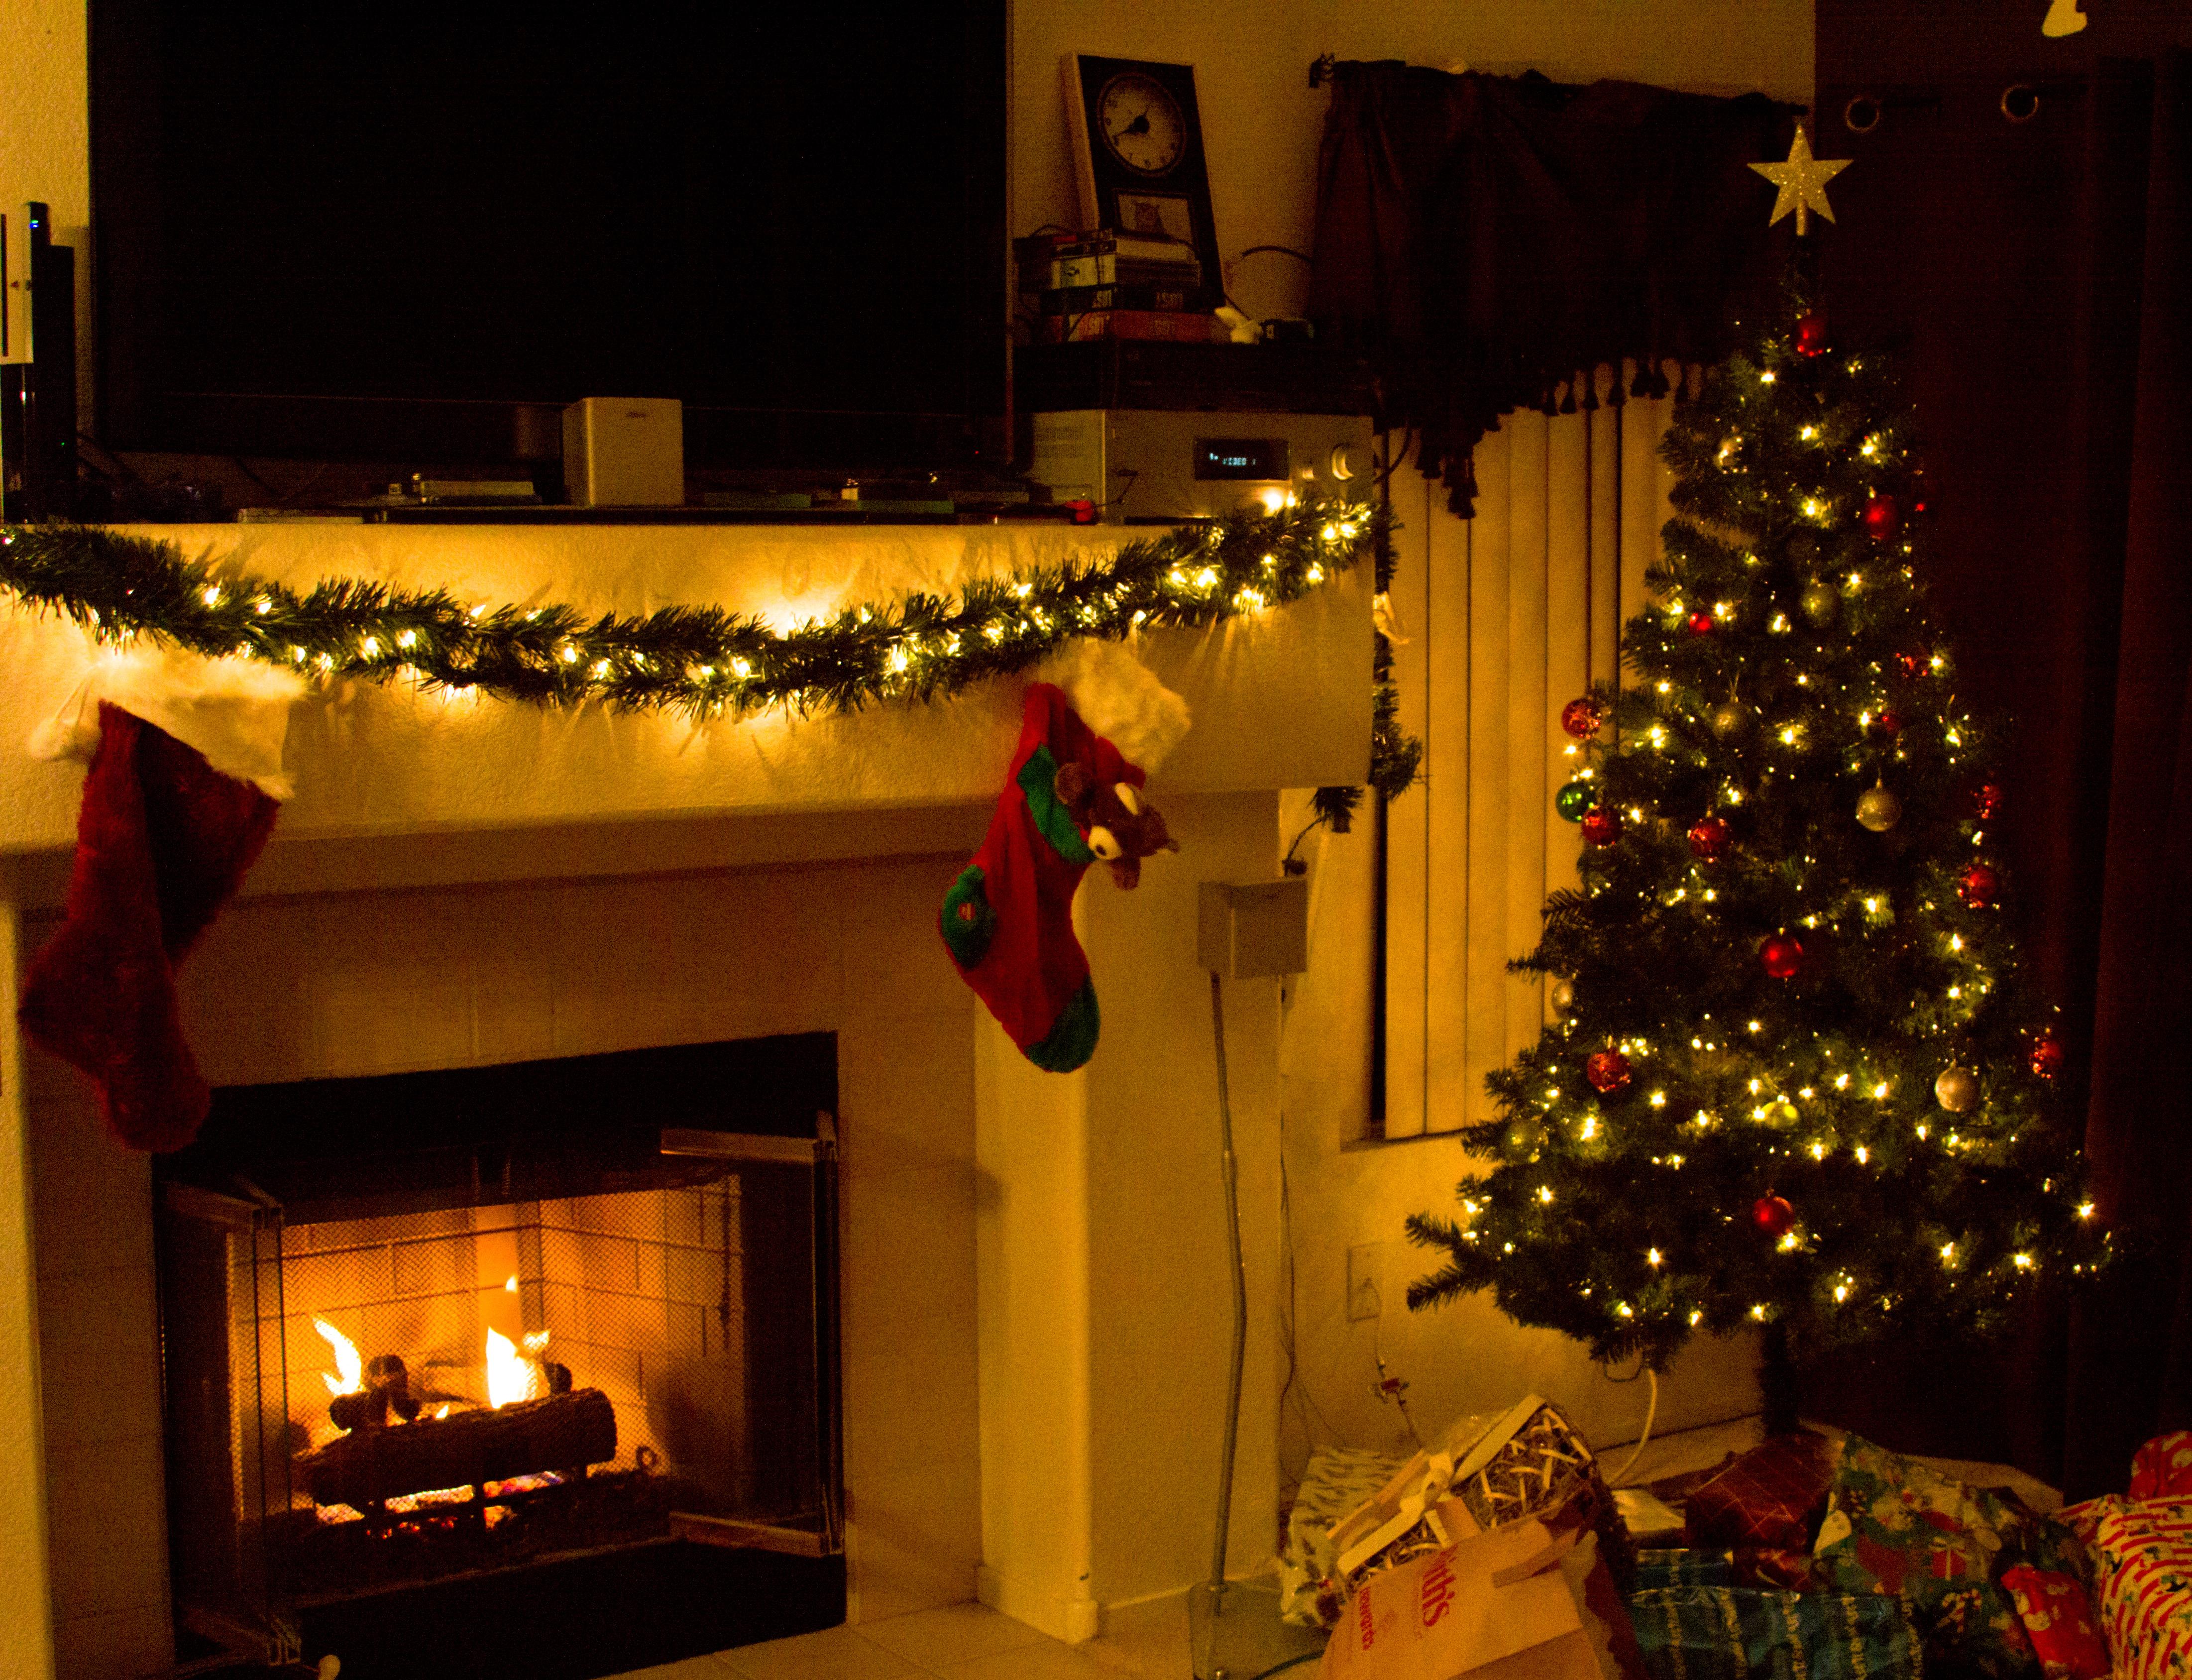 Christmas Hearth.Christmas Hearth Bloomiverse